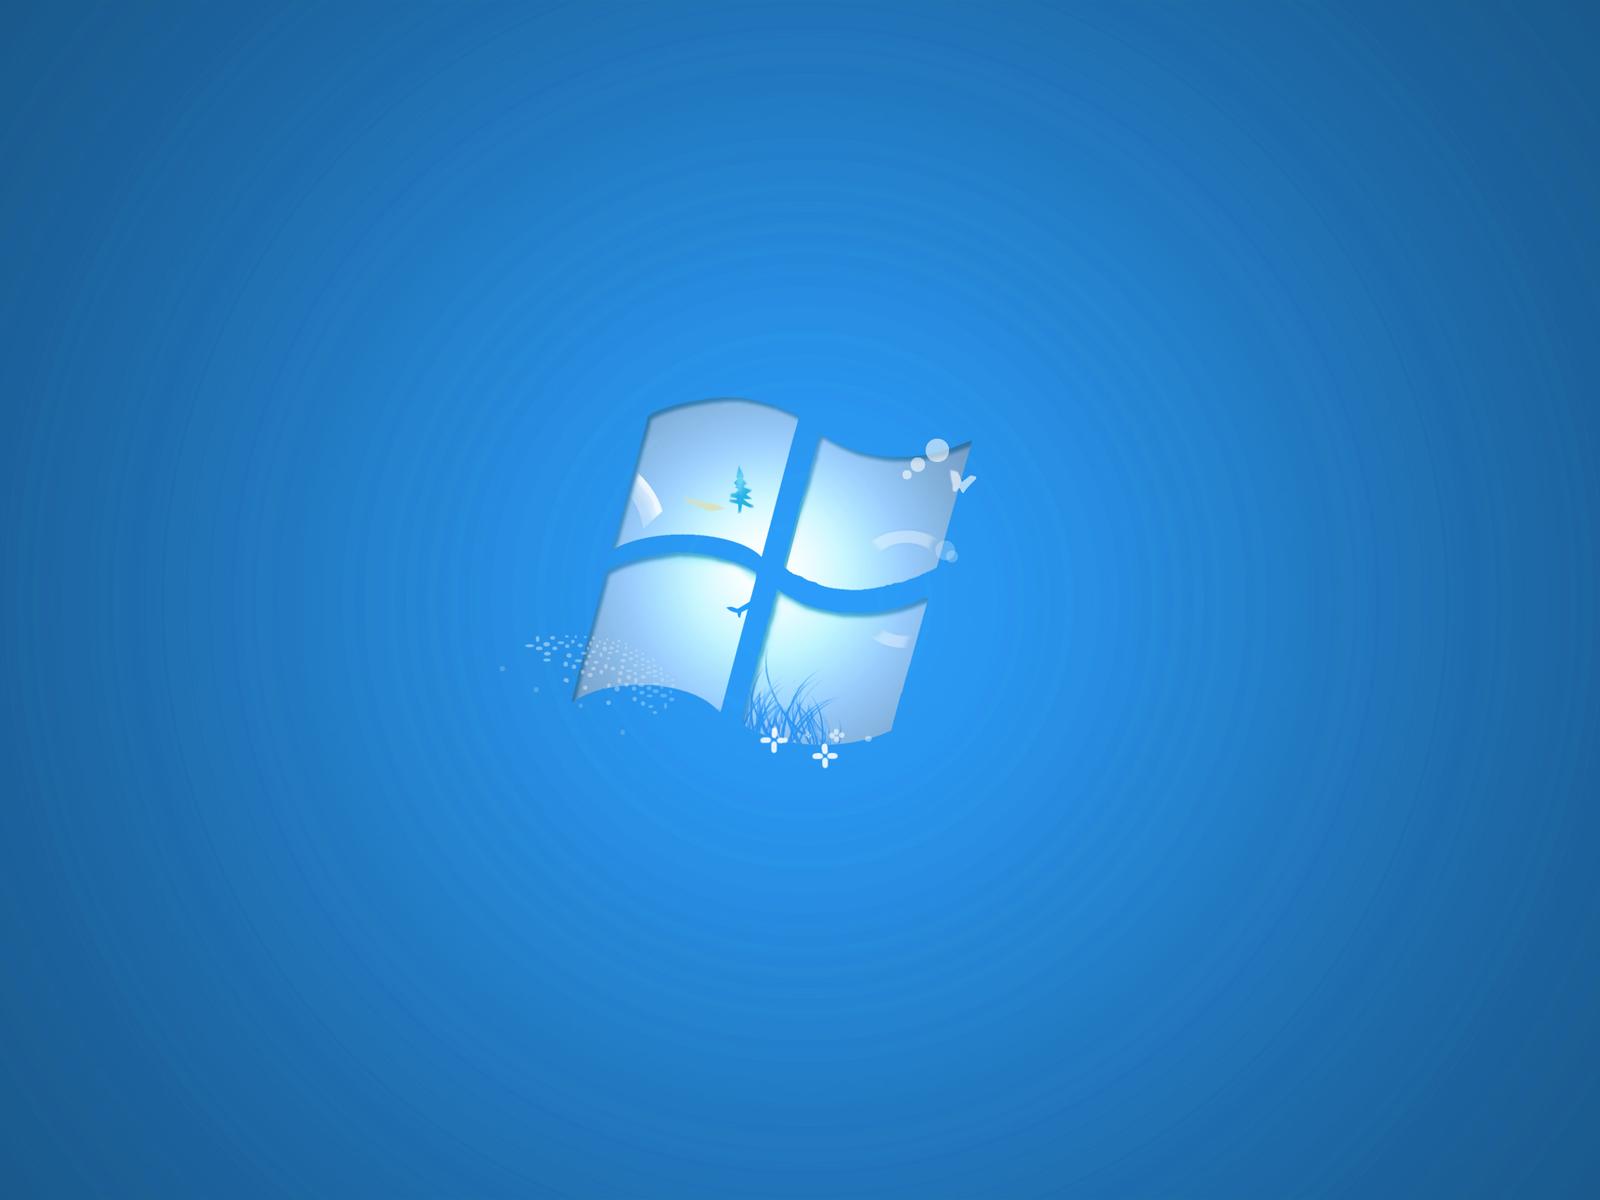 hd wallpapers 1080p windows 10 1920x1080